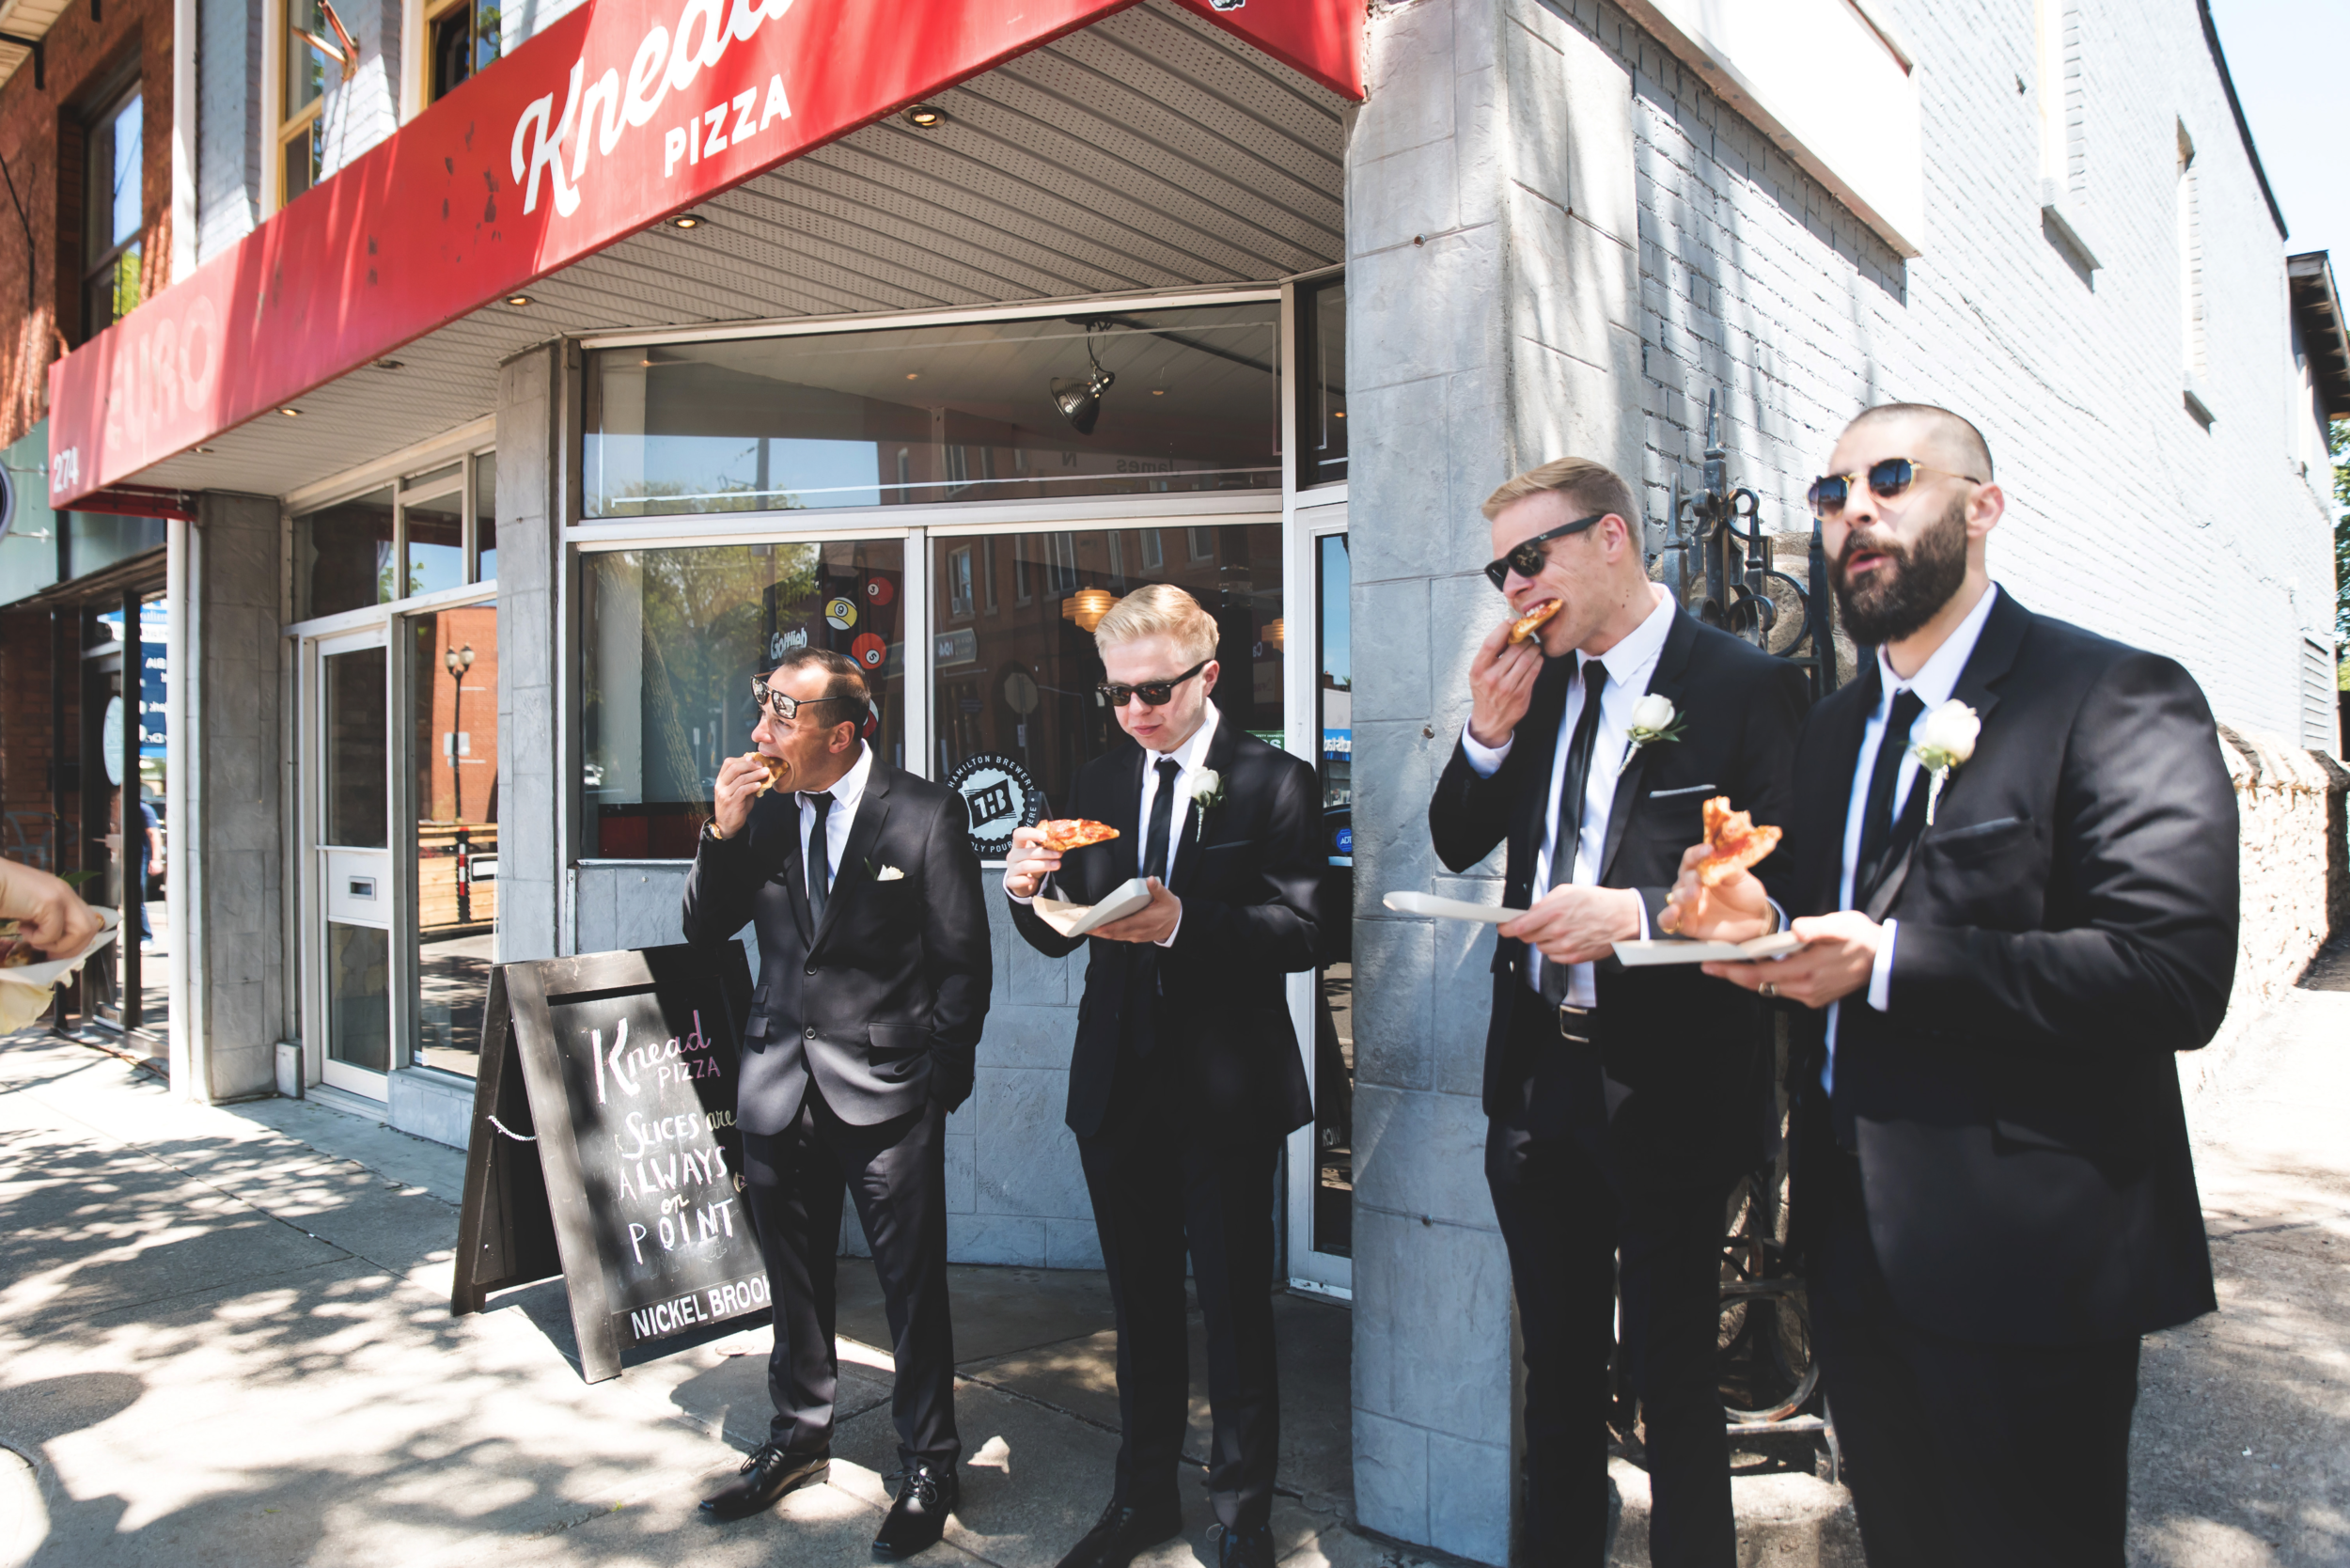 Wedding-Harbour-Banquet-Center-Oakville-Photographer-Wedding-Hamilton-Saint-James-Espresso-Downtown-HamOnt-GTA-Niagara-Toronto-Moments-by-Lauren-Photography-Photo-Image-31.png